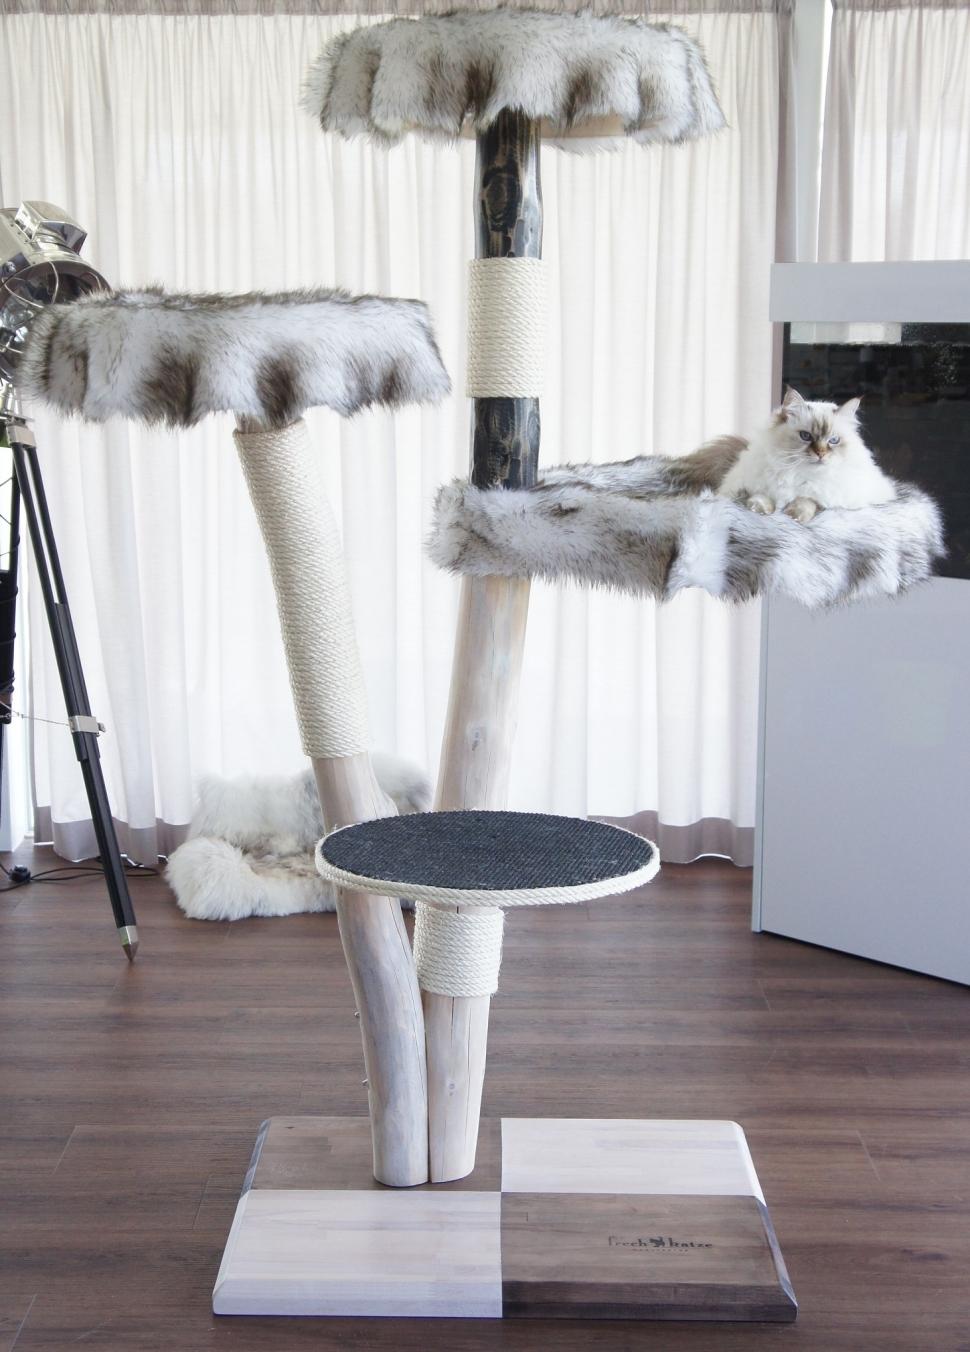 naturkratzbaum haskil. Black Bedroom Furniture Sets. Home Design Ideas